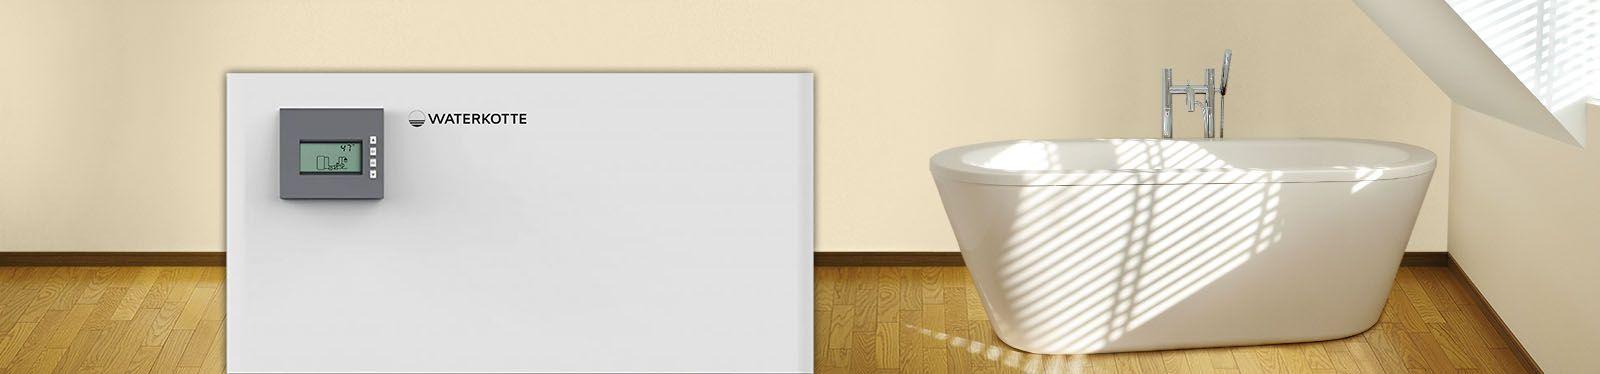 waterkotte ecopack kompakt trinkwassererw rmer 38 100 kw. Black Bedroom Furniture Sets. Home Design Ideas